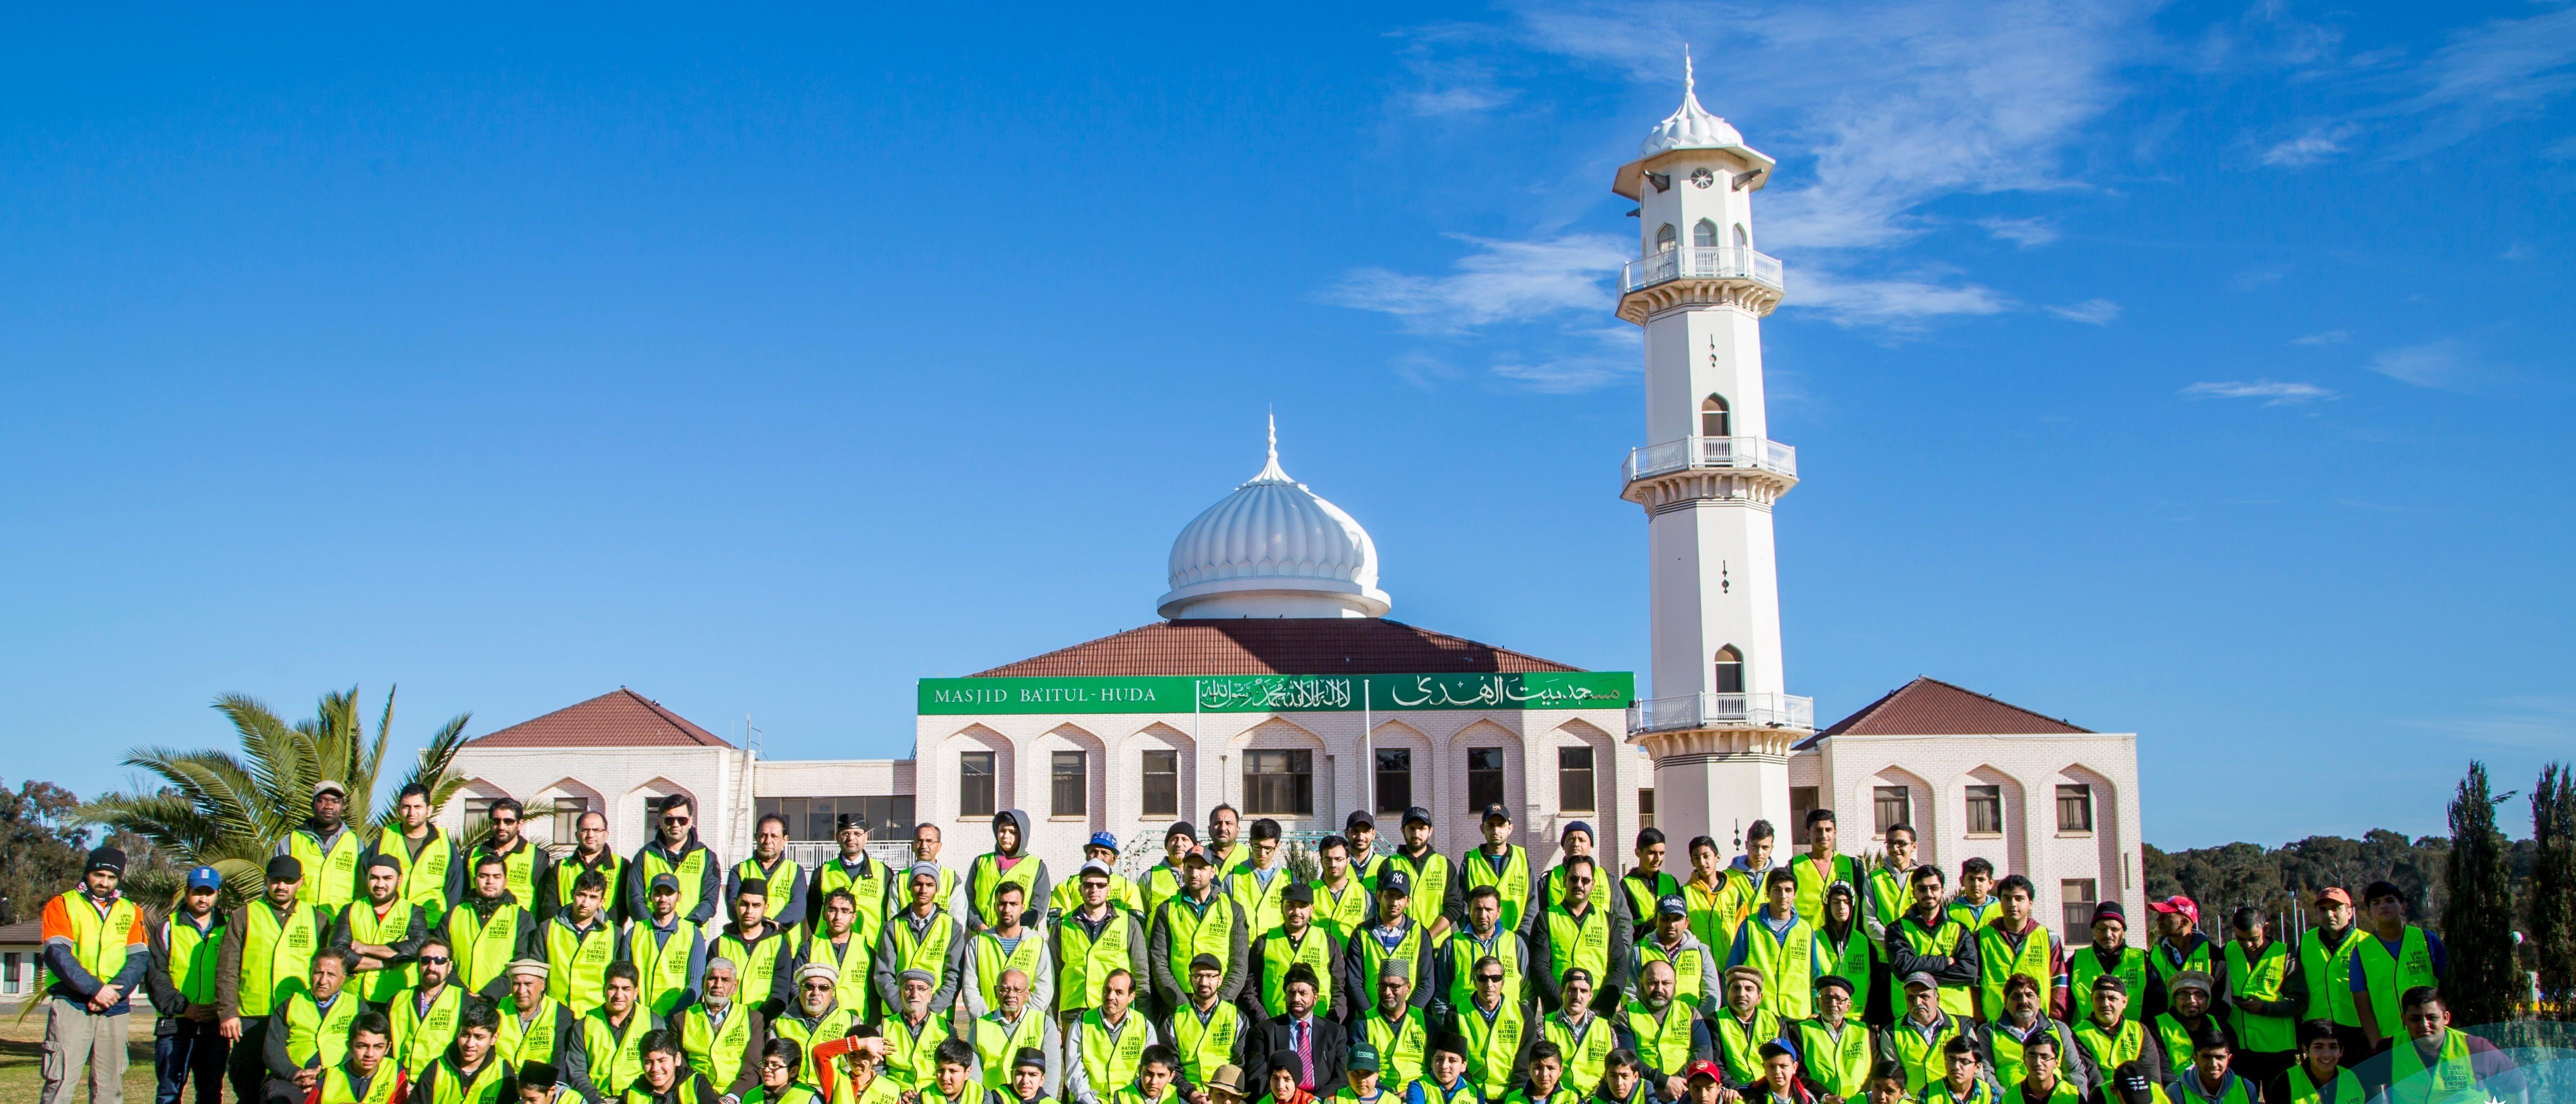 Ahmadi Muslims NSW - Parramatta Park, Boer War Memorial, Wistaria Gardens